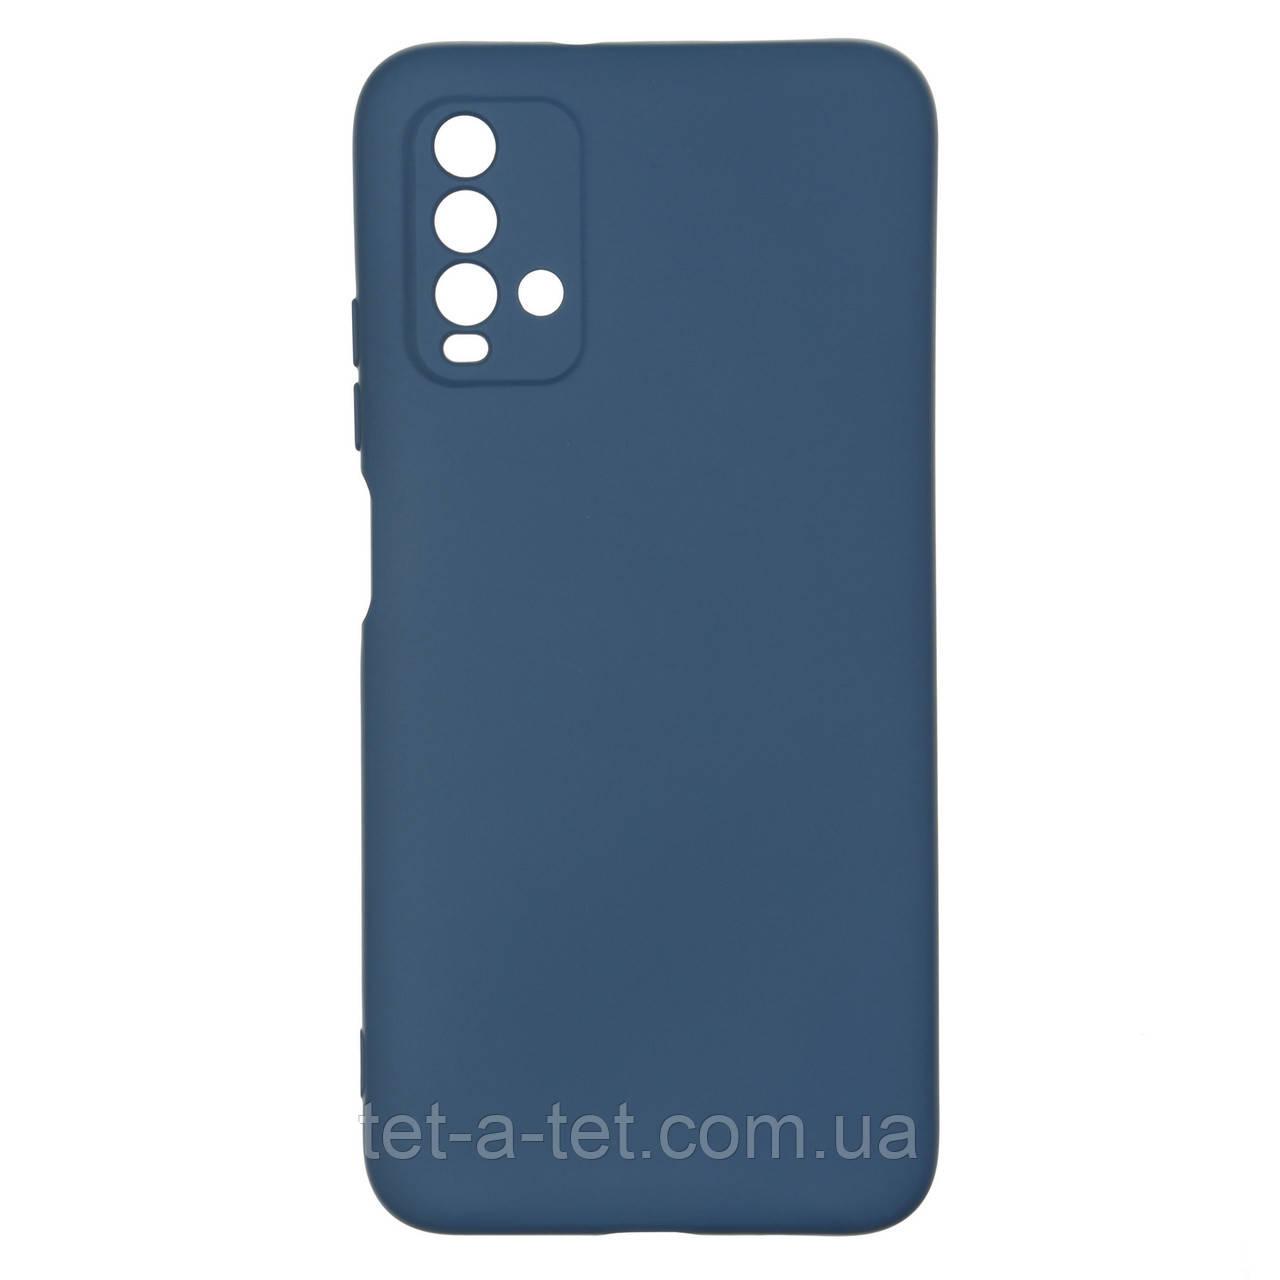 Чохол силіконовий ArmorStandart ICON Case for Xiaomi Redmi 9T Dark Blue